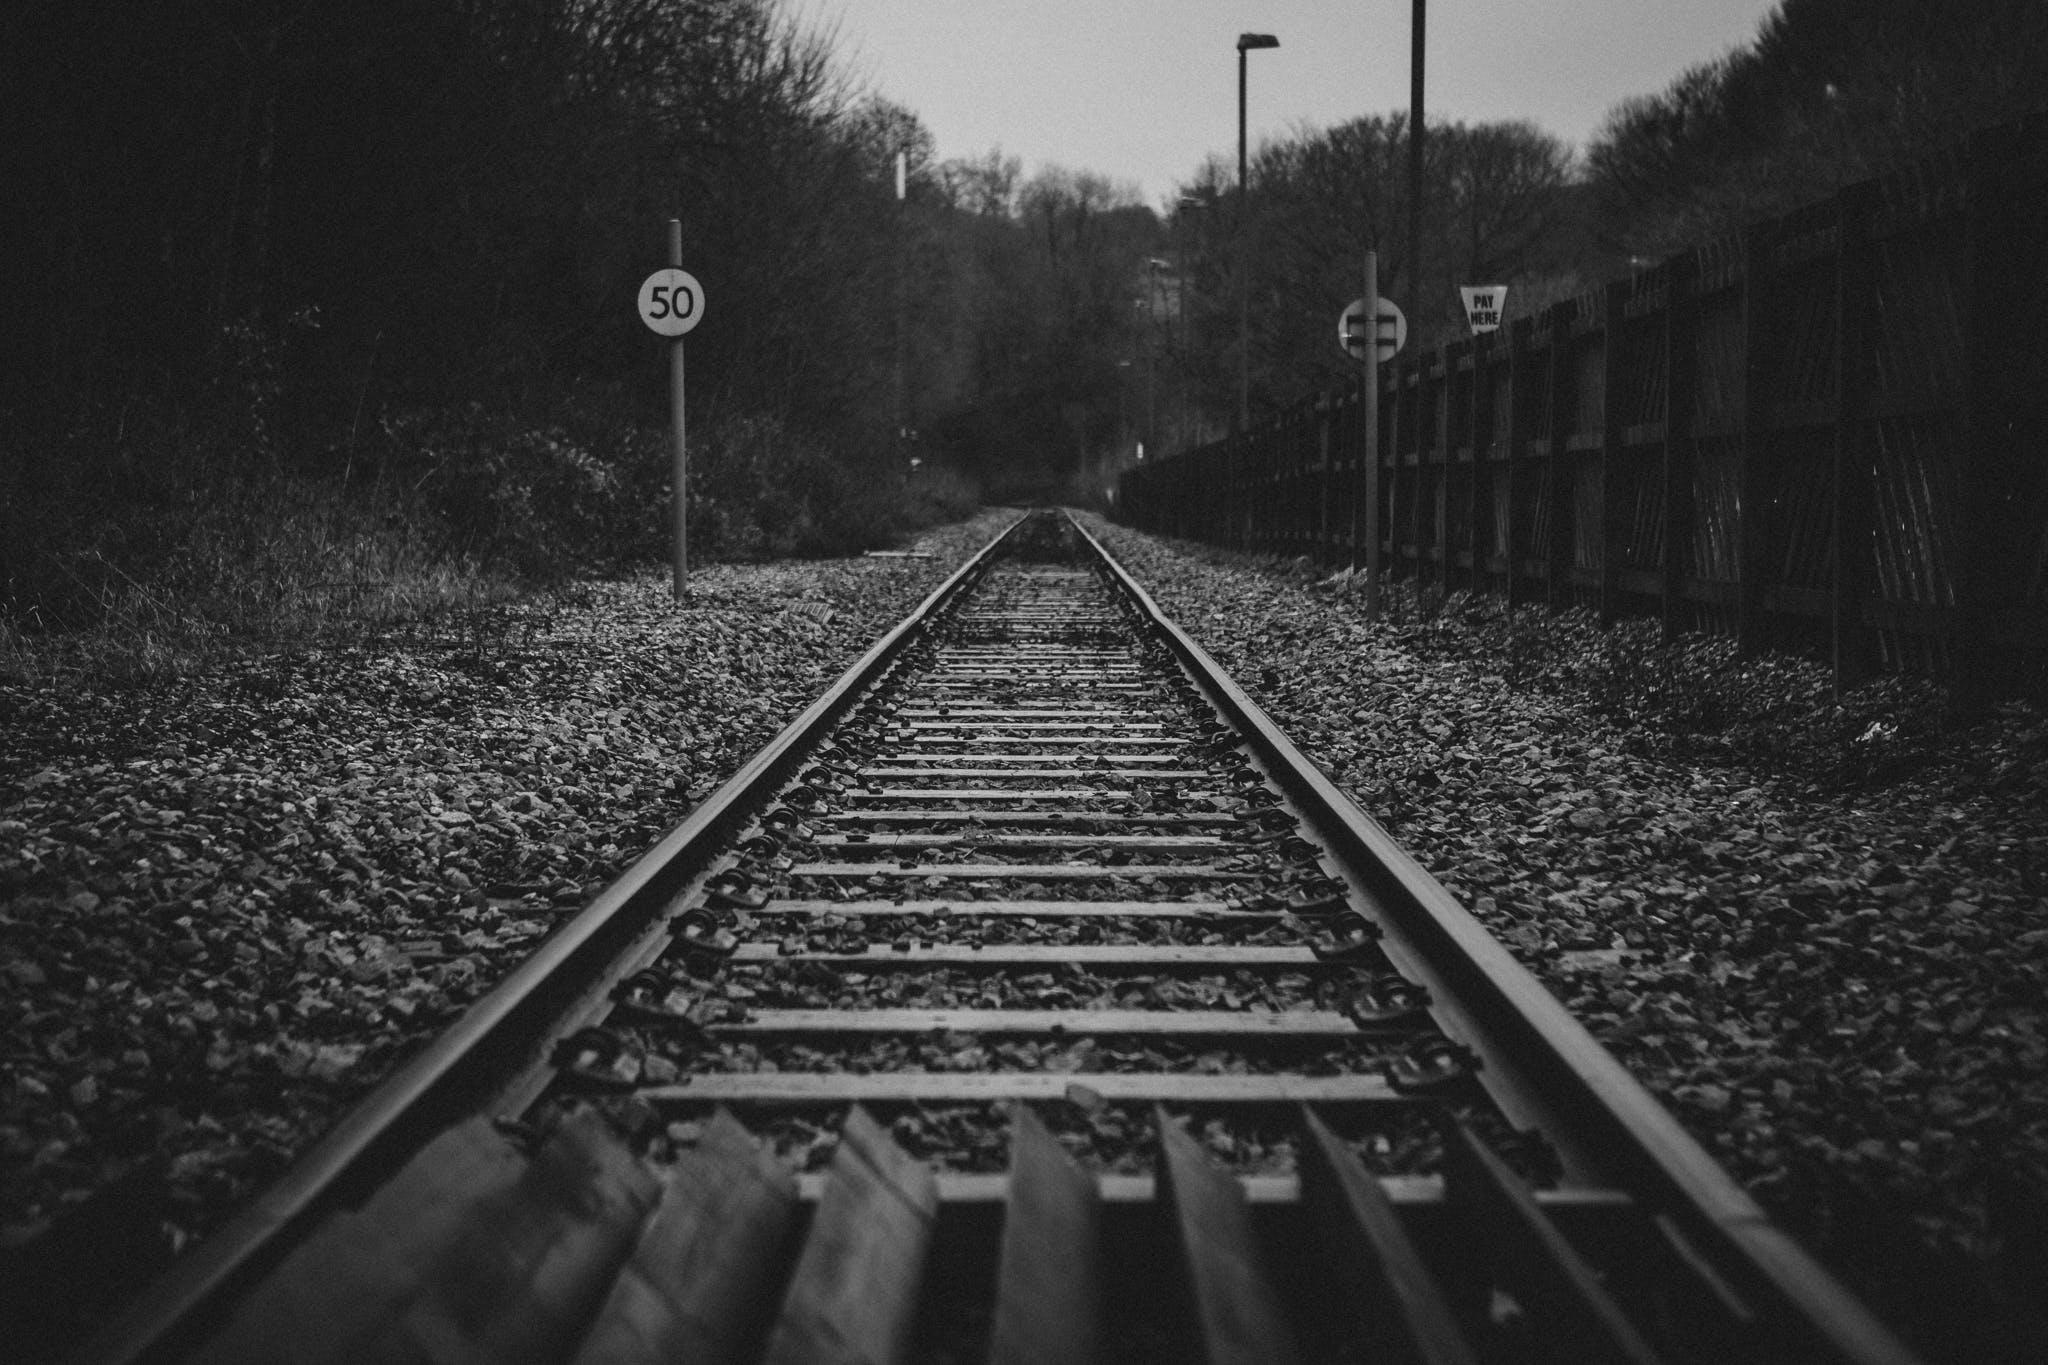 Free stock photo of street, train, urban, grunge